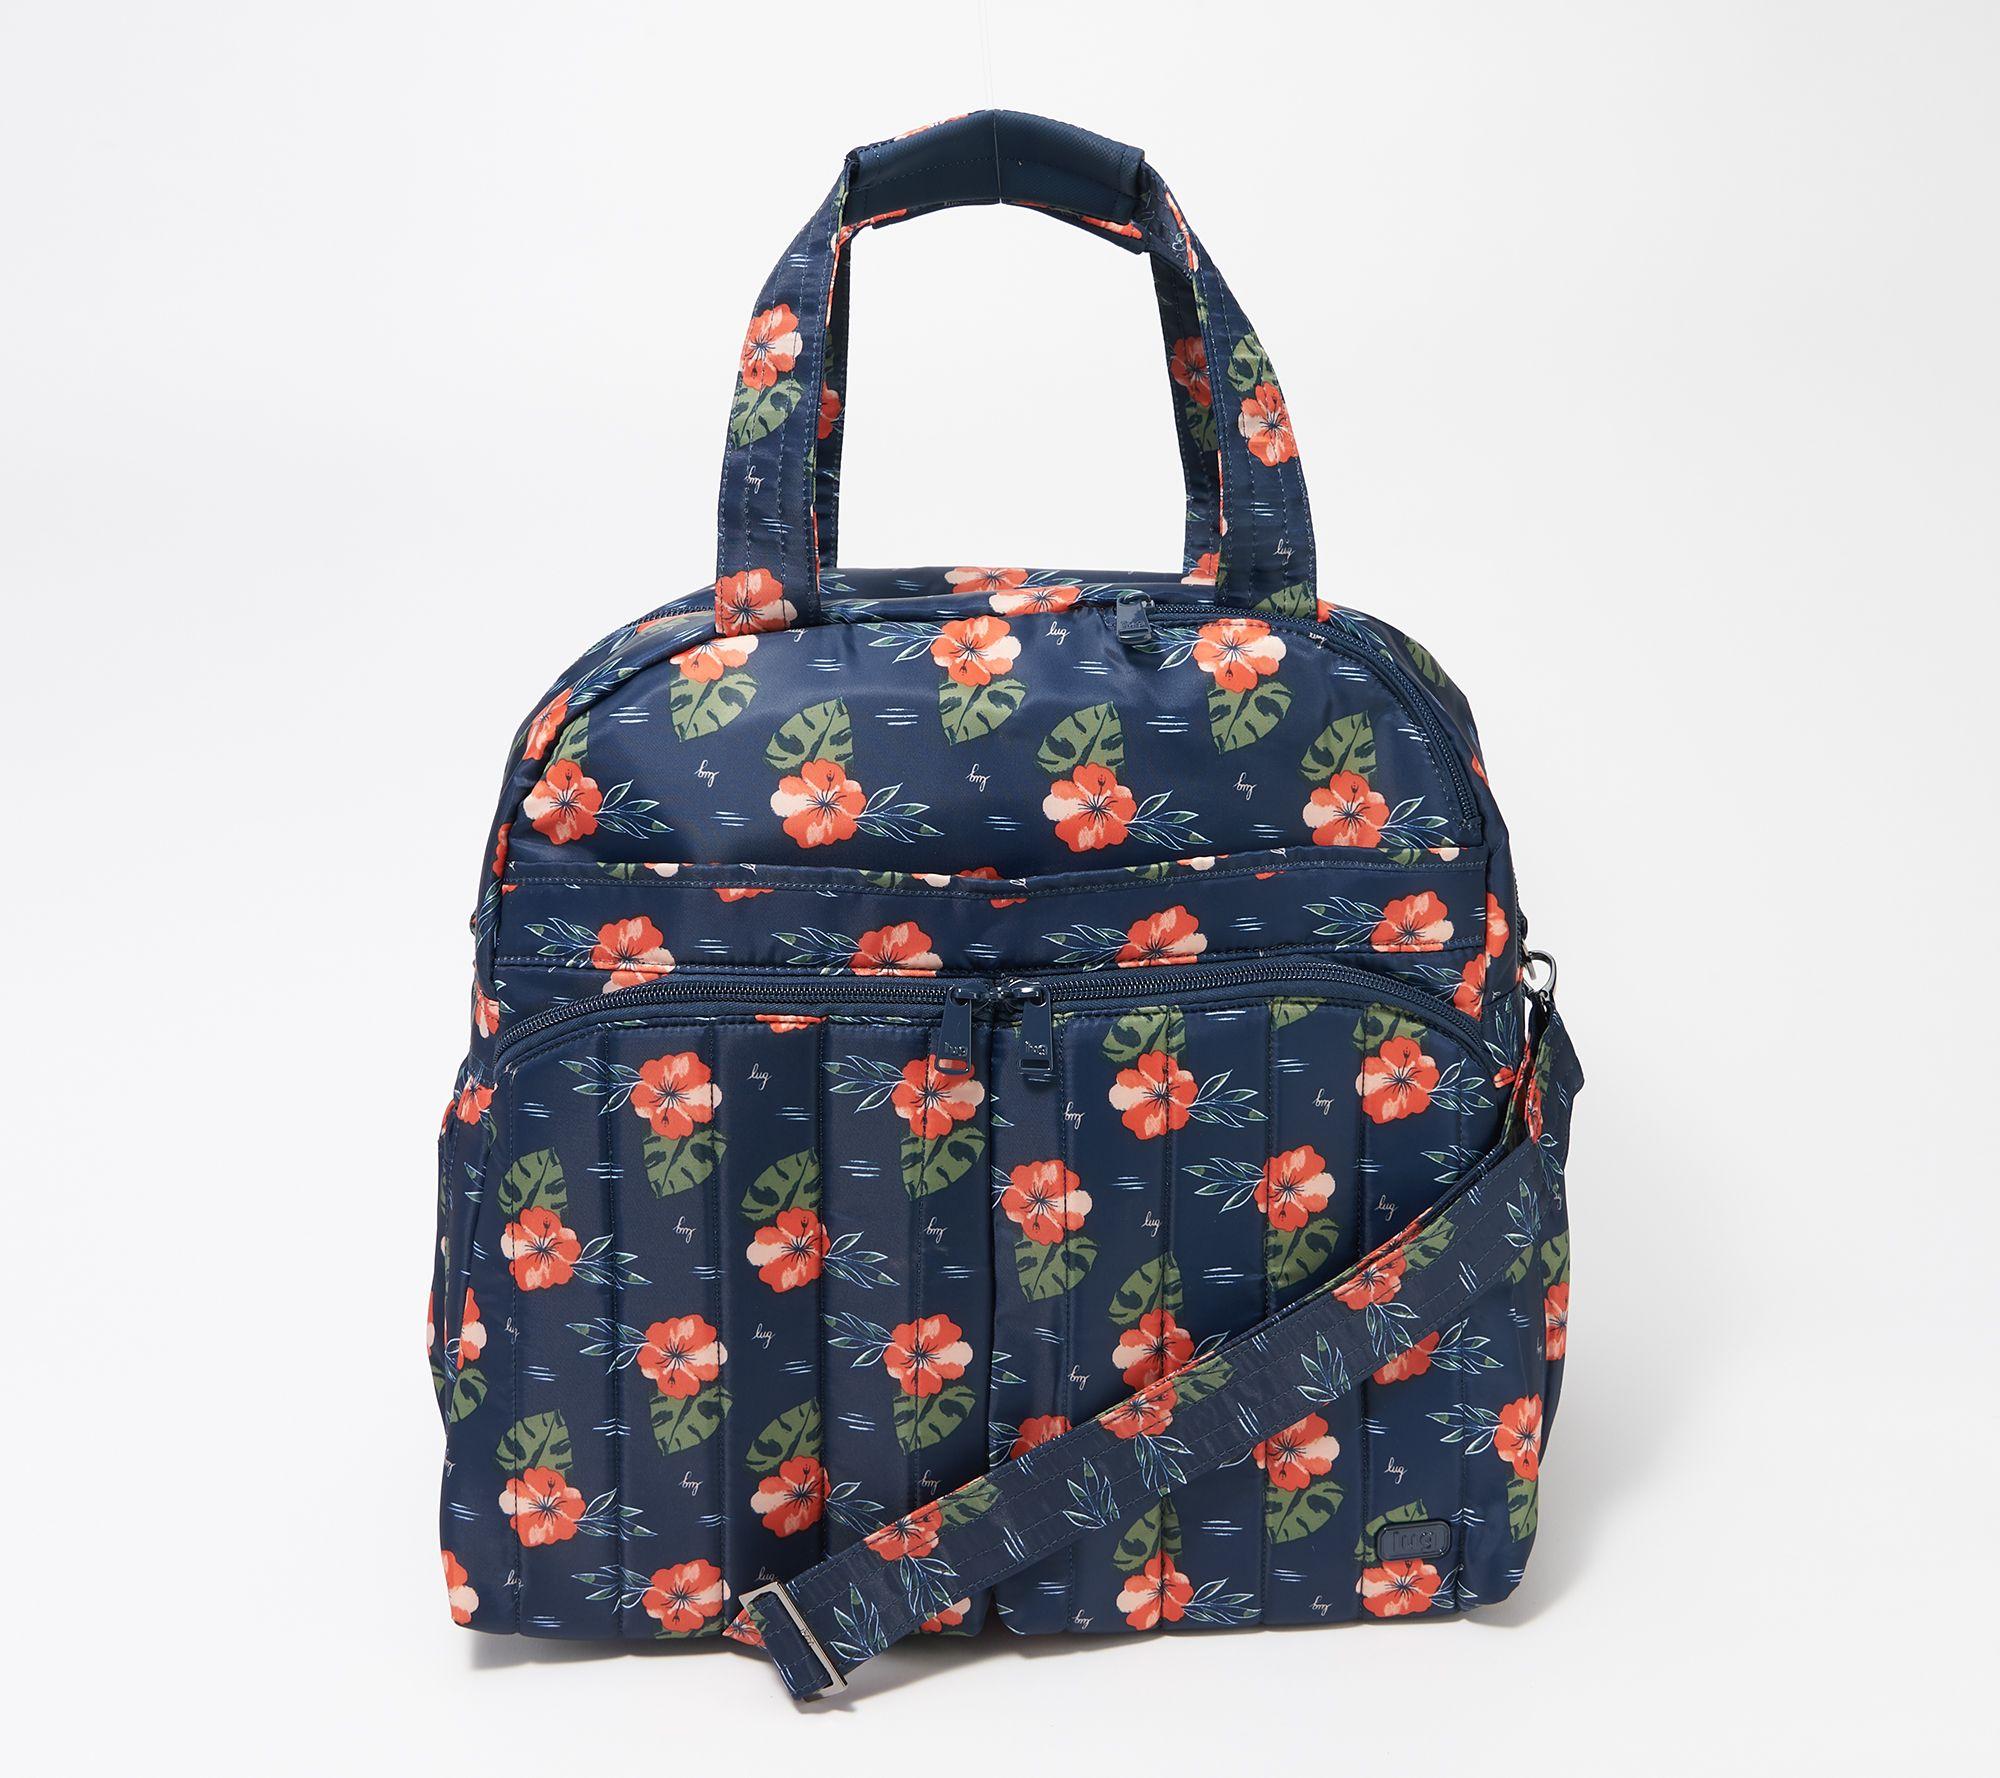 Lug Convertible Overnight Bag w  RFID - Boxer 2 - Page 1 — QVC.com 82490ad48c0d0